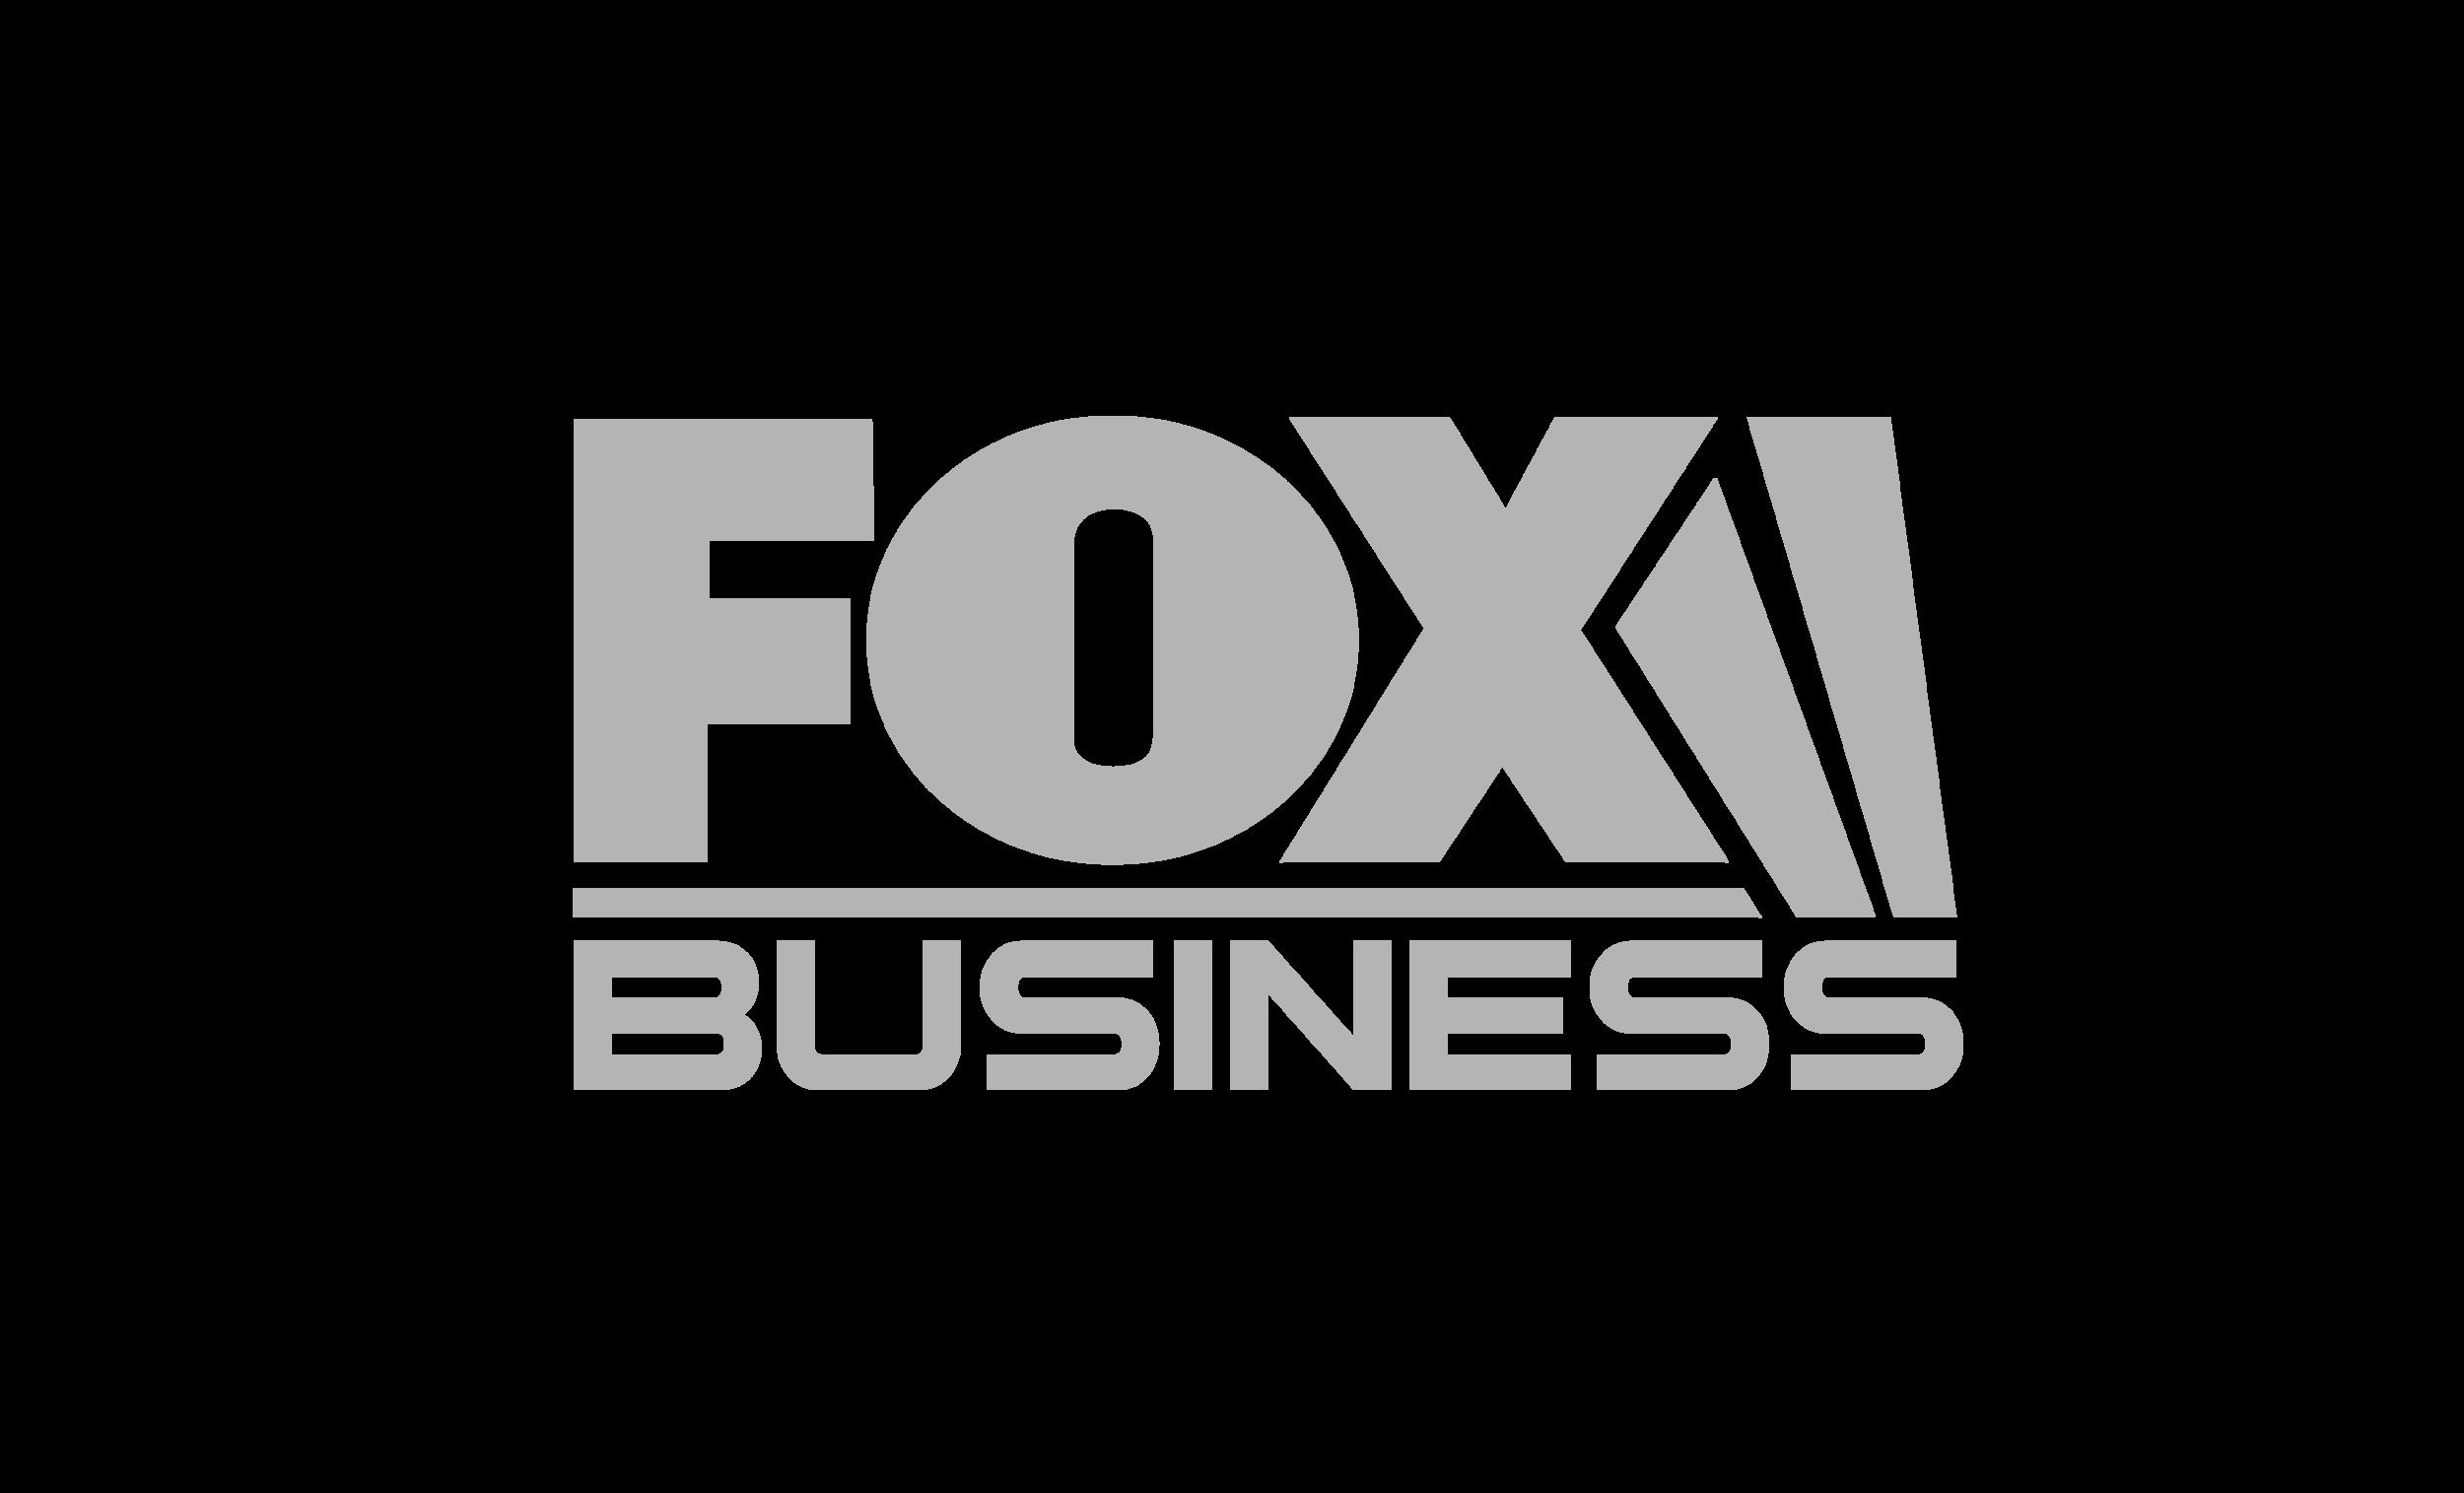 Fox_Business_logo.png